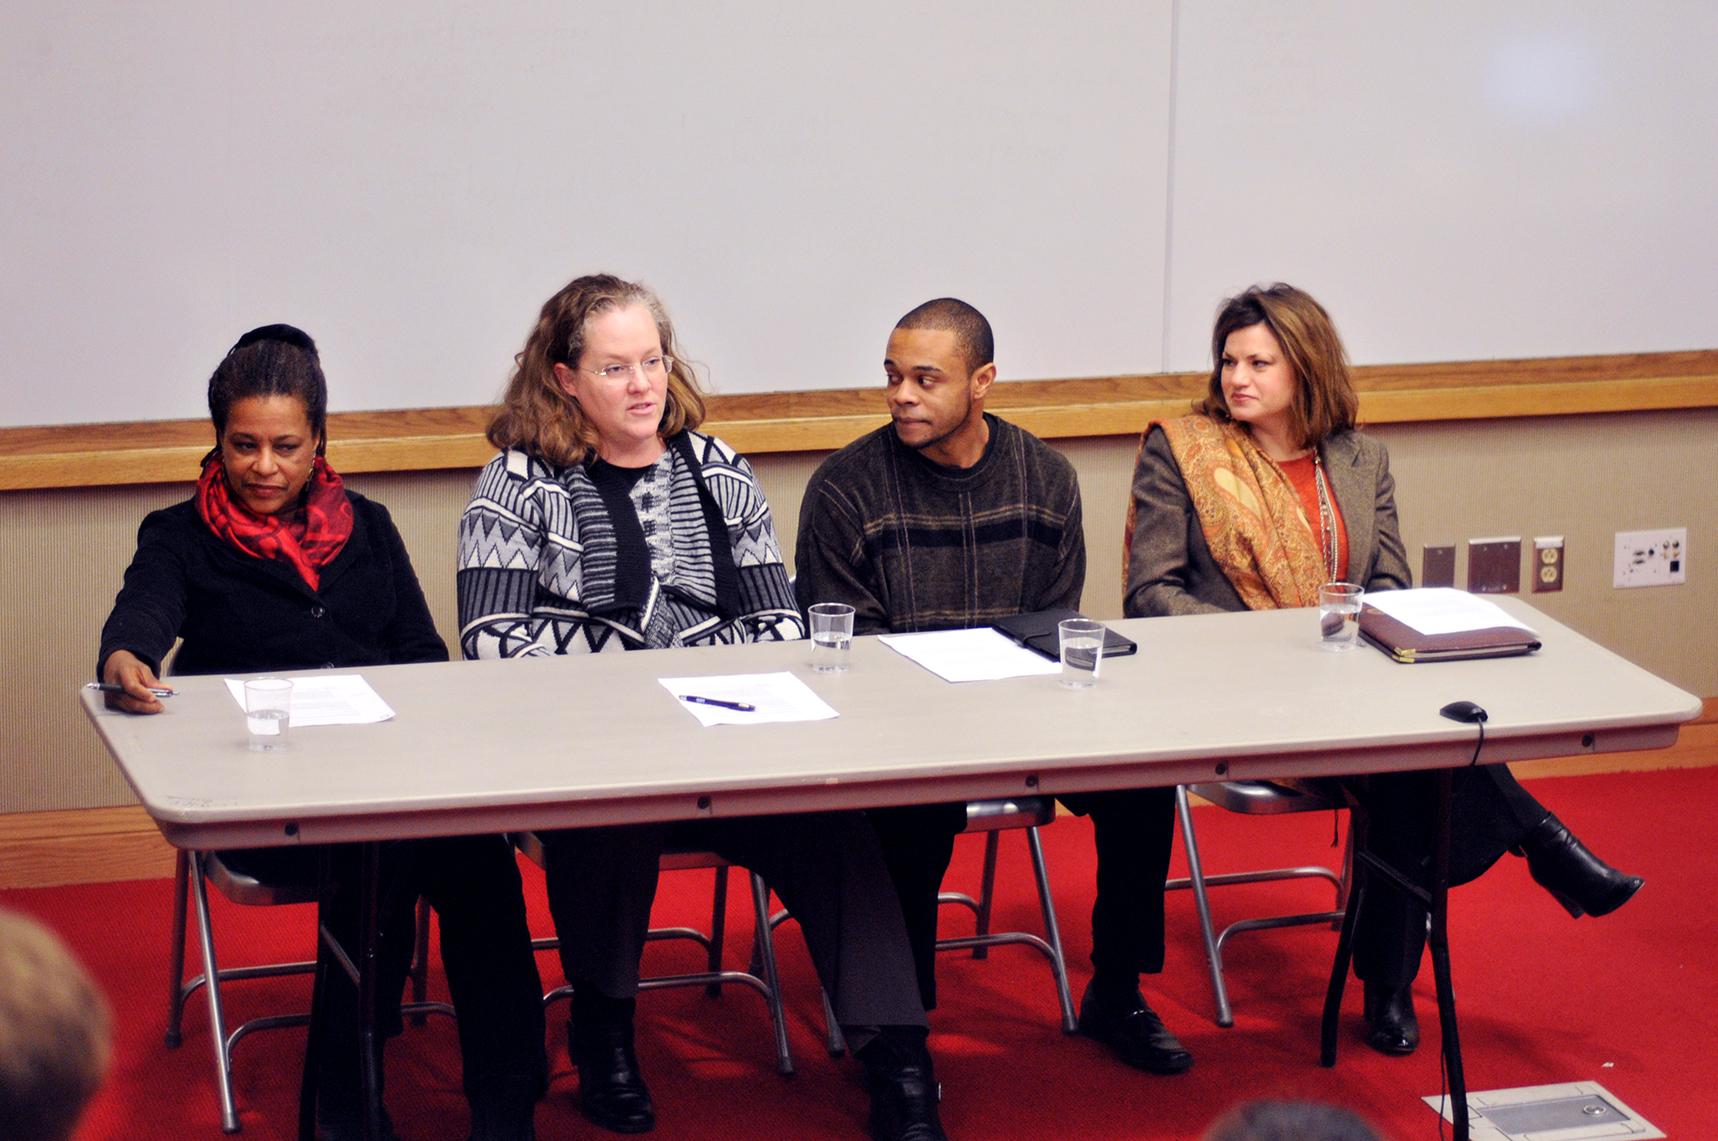 Panelists Cassandra Harris-Lockwood K'74, Dana Hubbard, Kevin Alexander '13 and Anne Lansing.